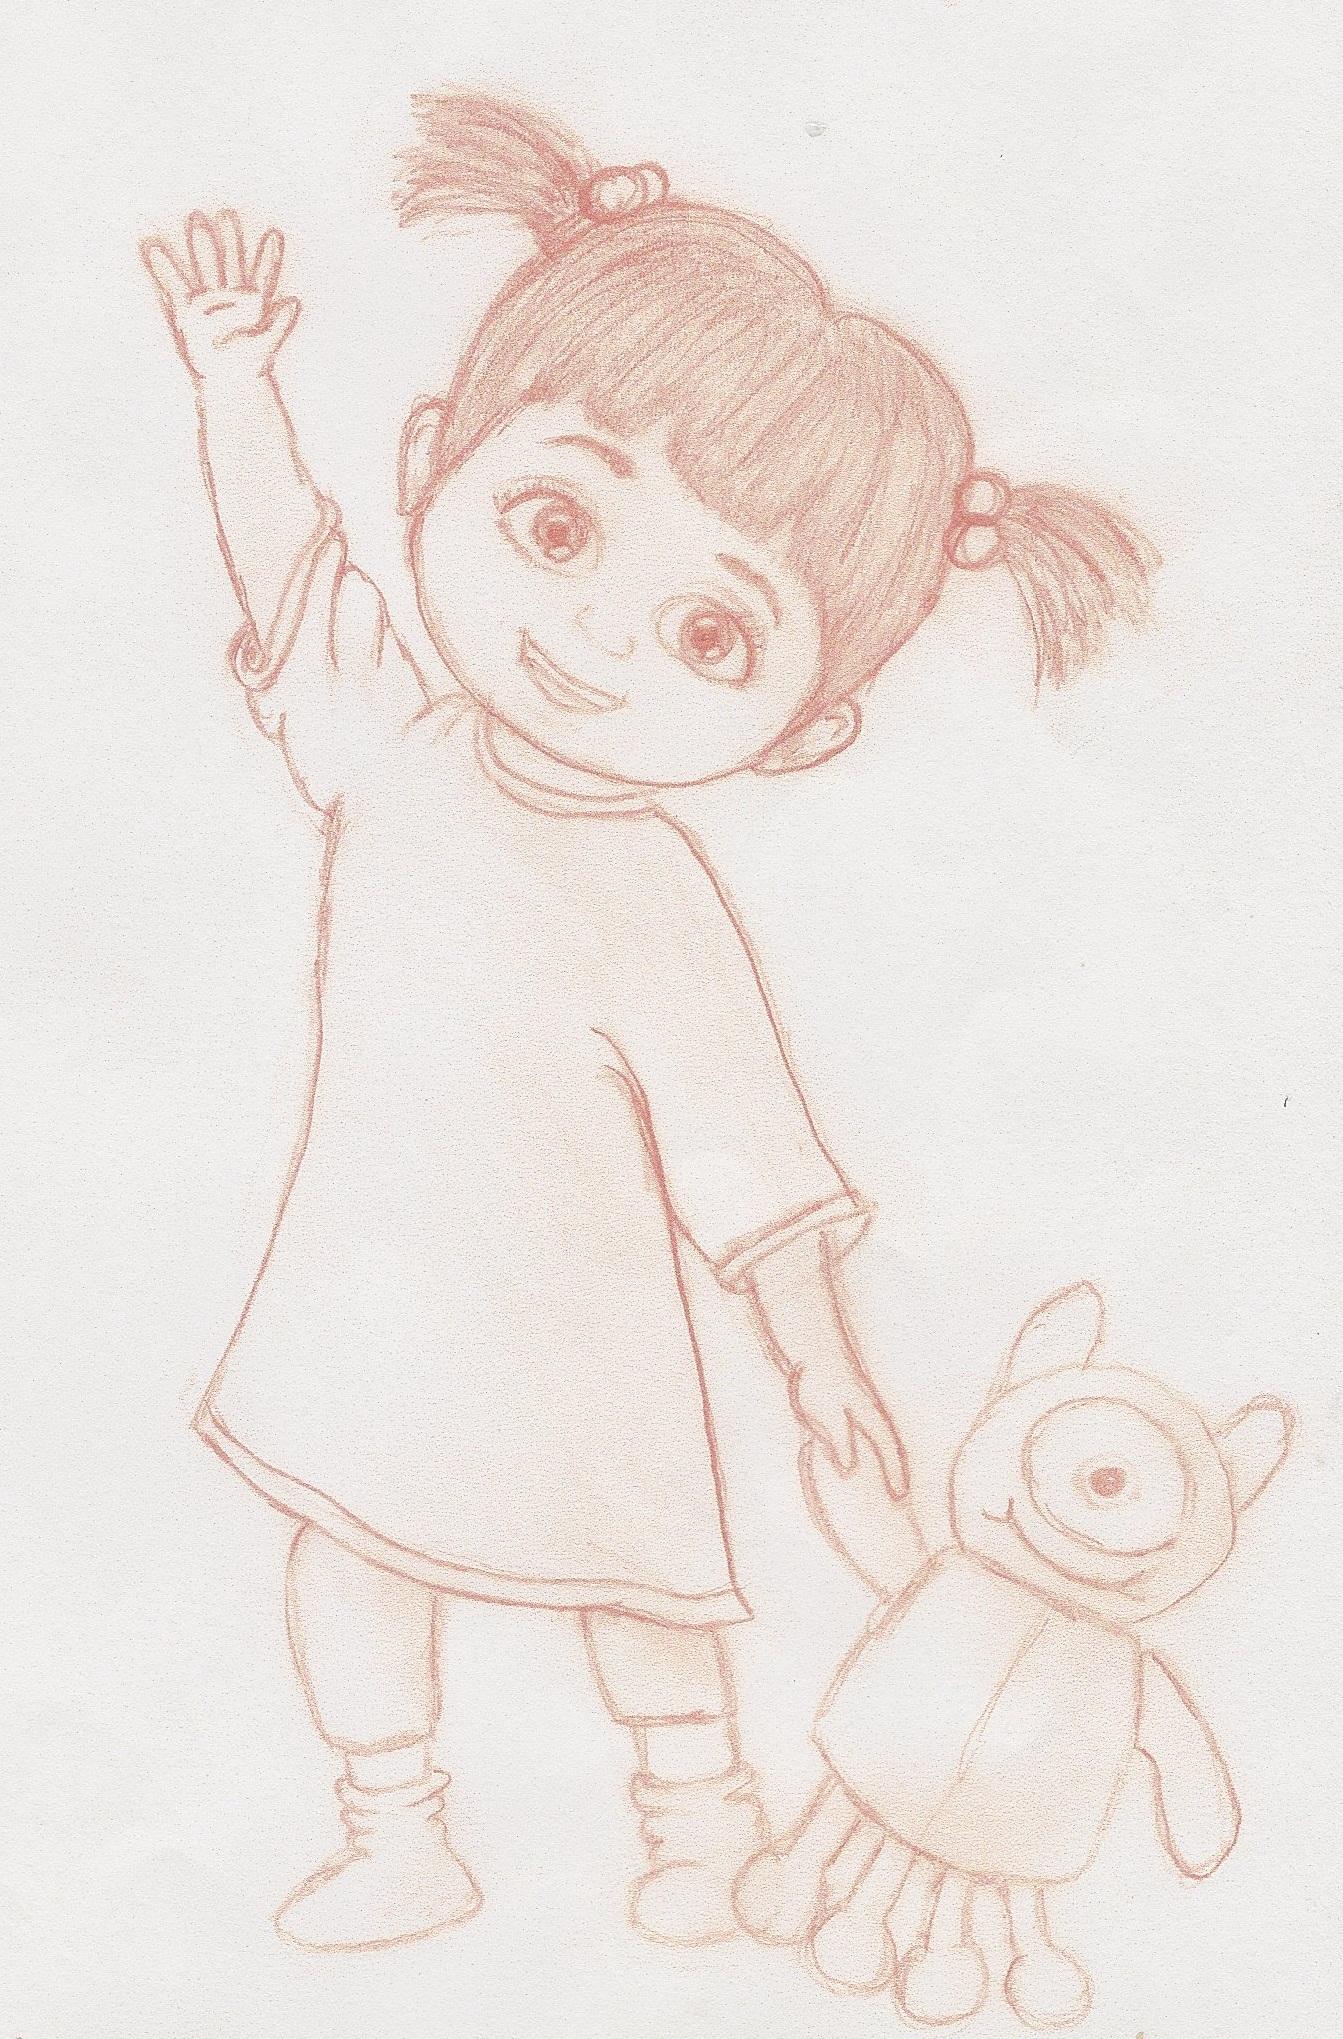 Boo Sketch Monsters Inc By Misspurplepanda On Deviantart